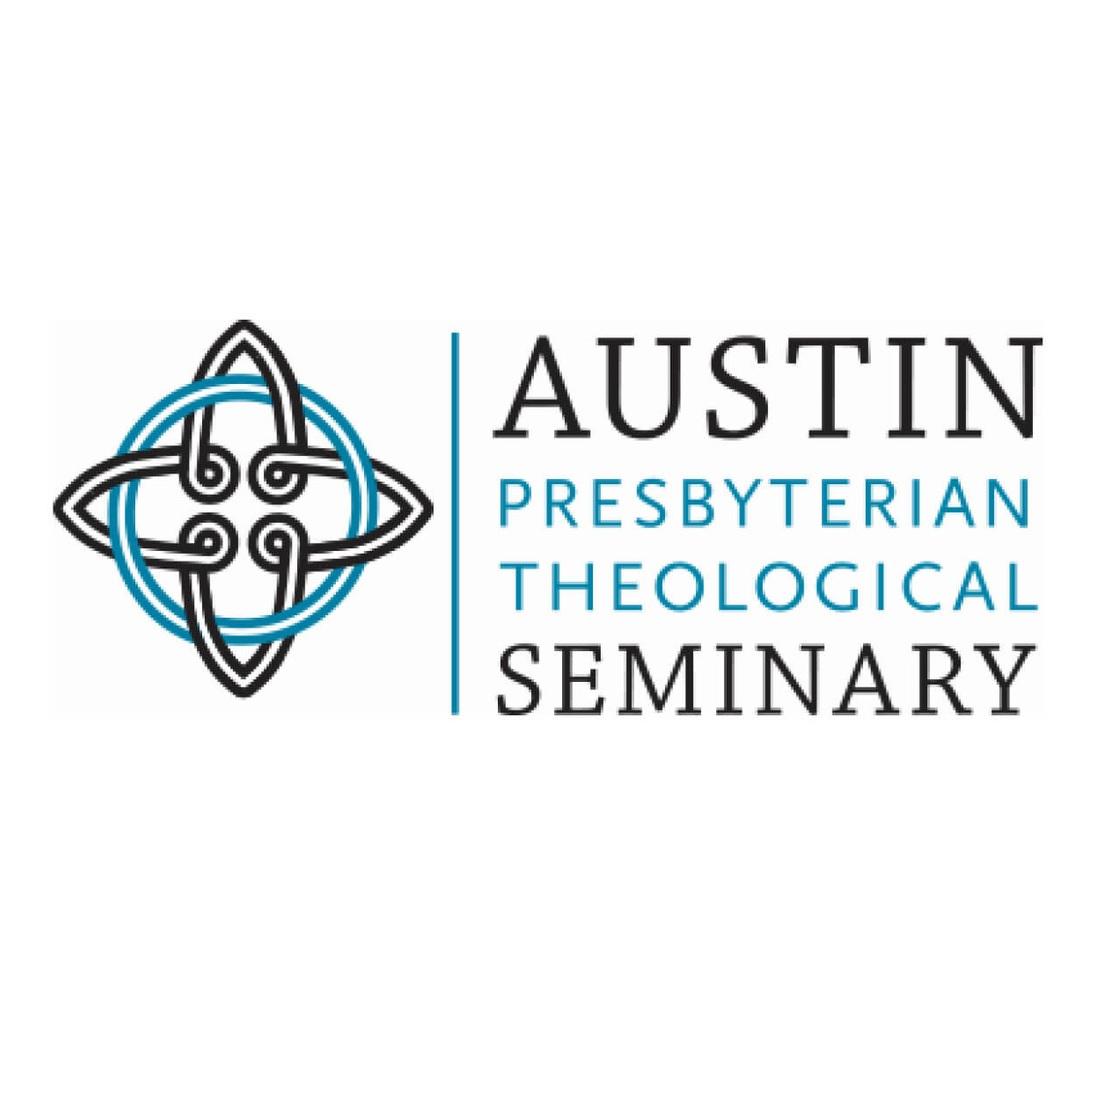 Copy of Austin Presbyterian Theological Seminary